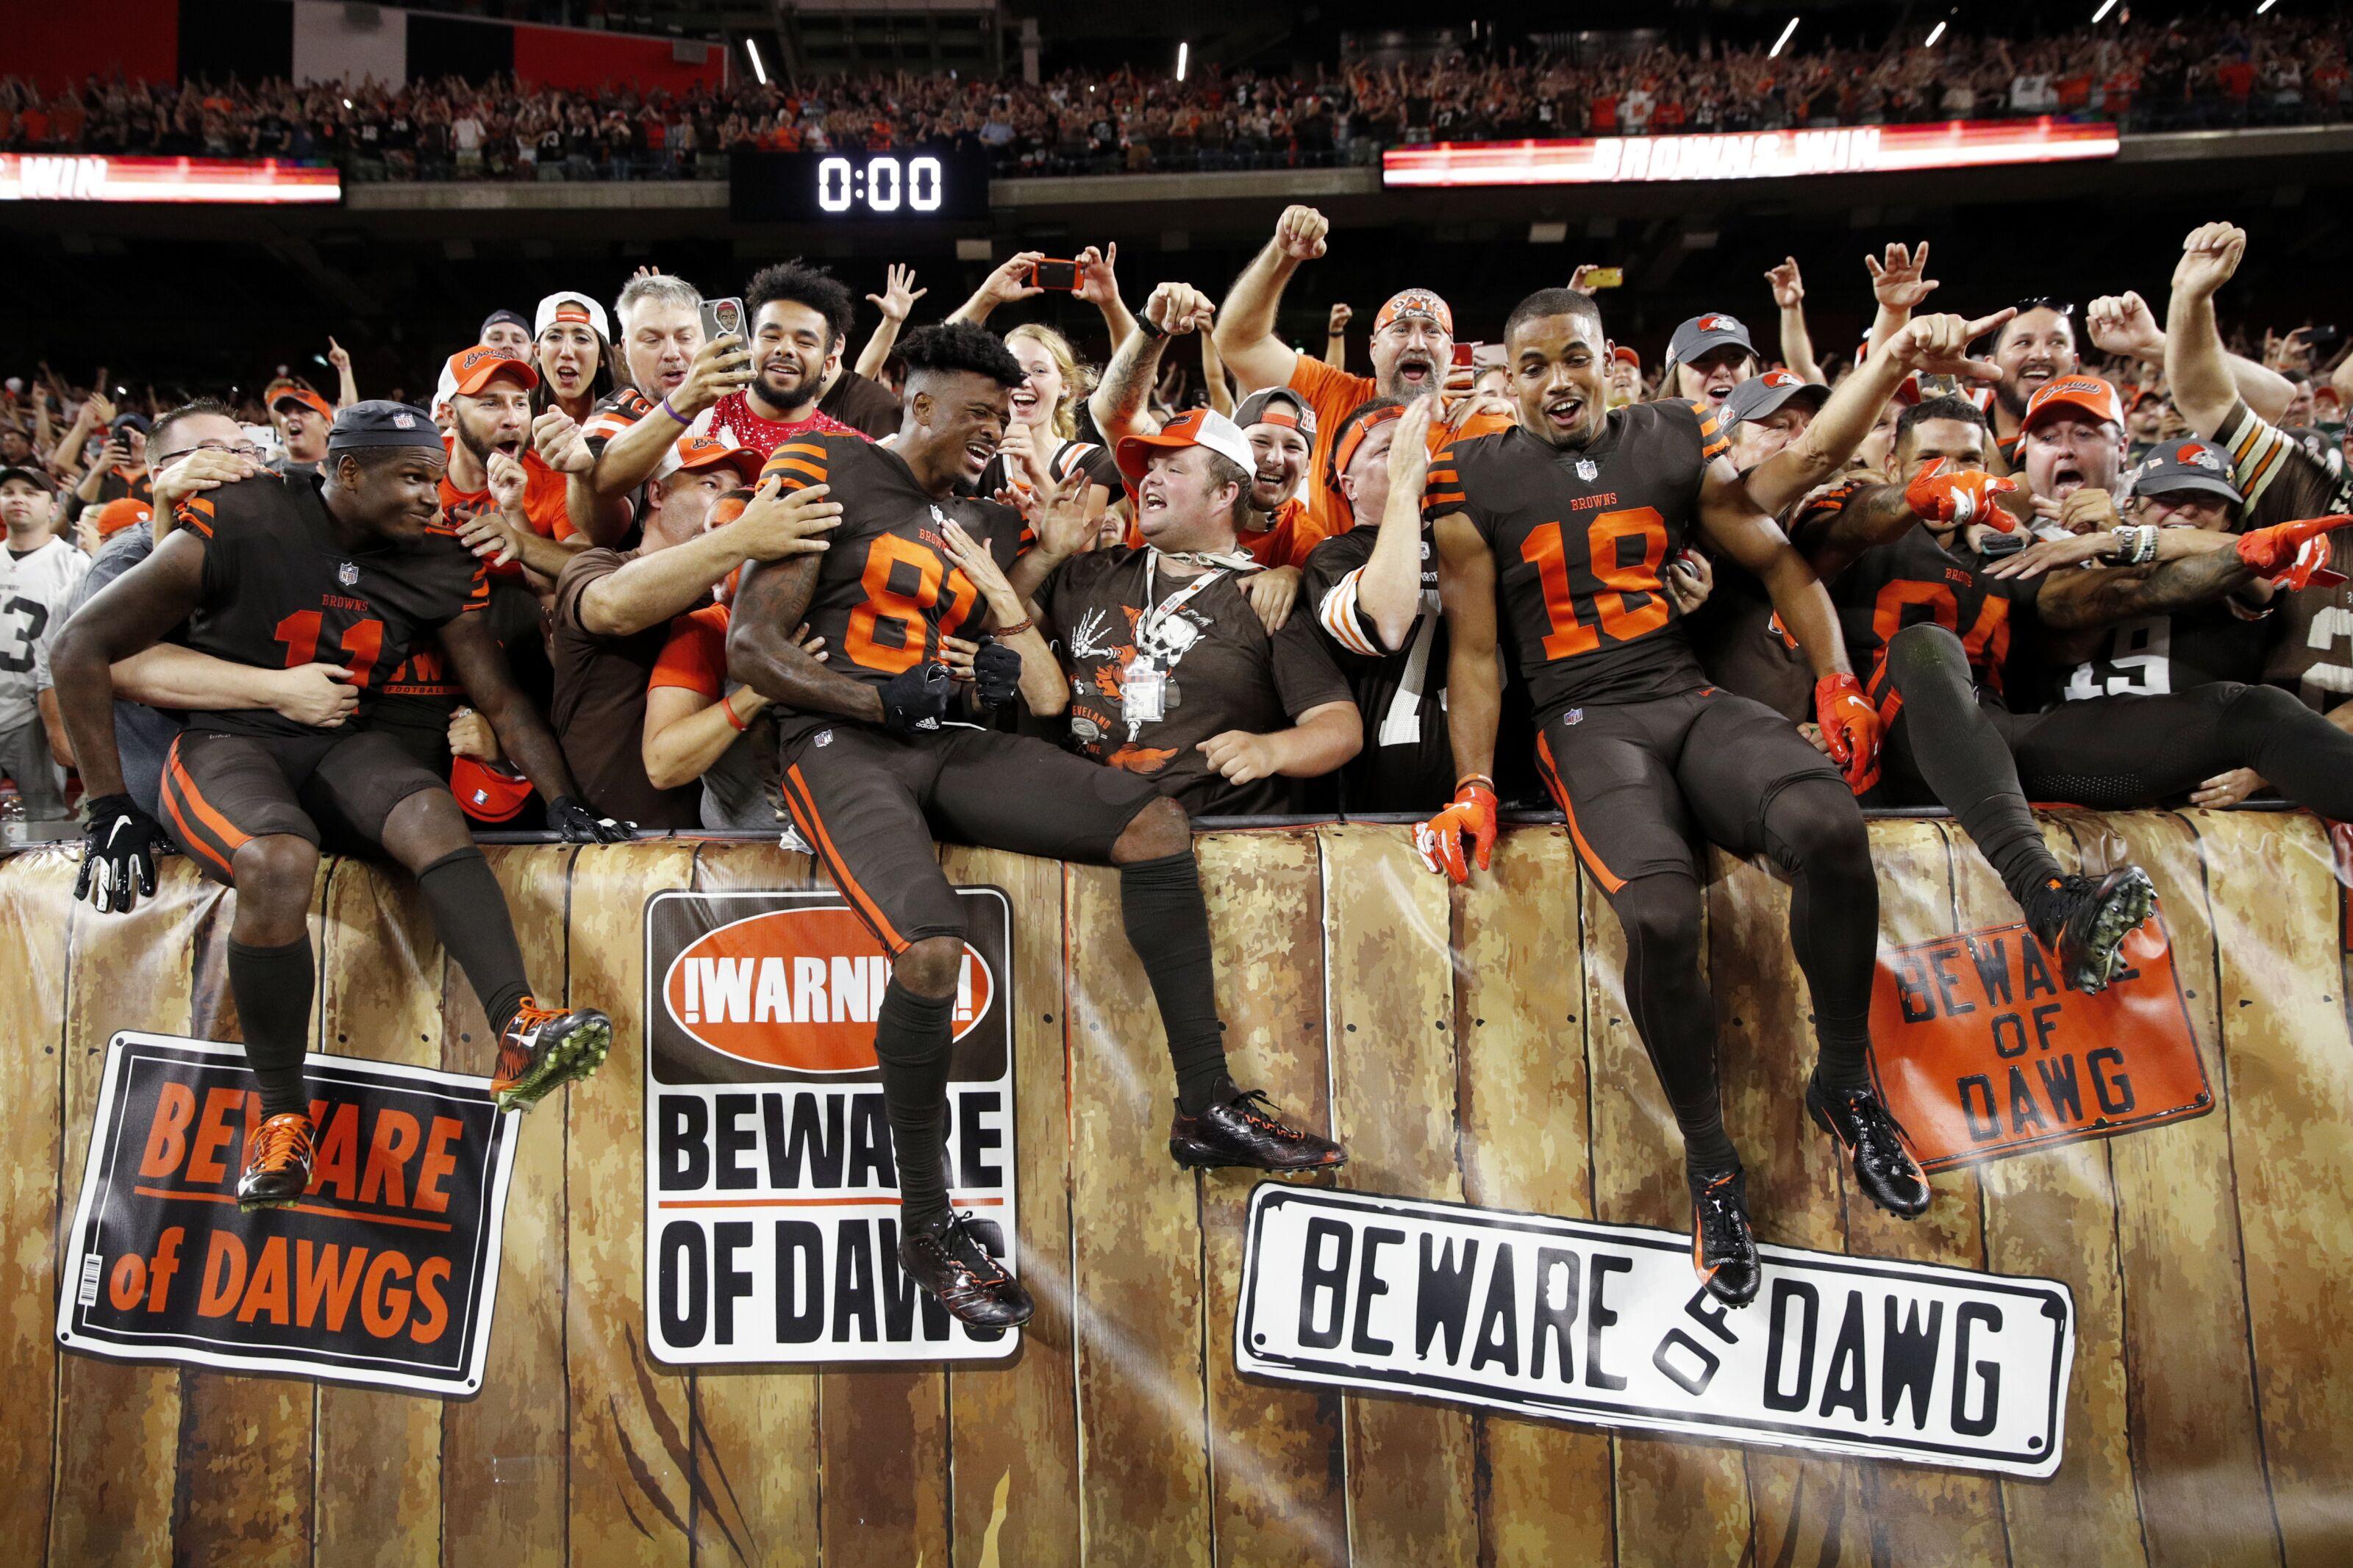 b1642ae8c Cleveland Browns Fan Rankings - Best Fans Cleveland Browns - Fandom 250